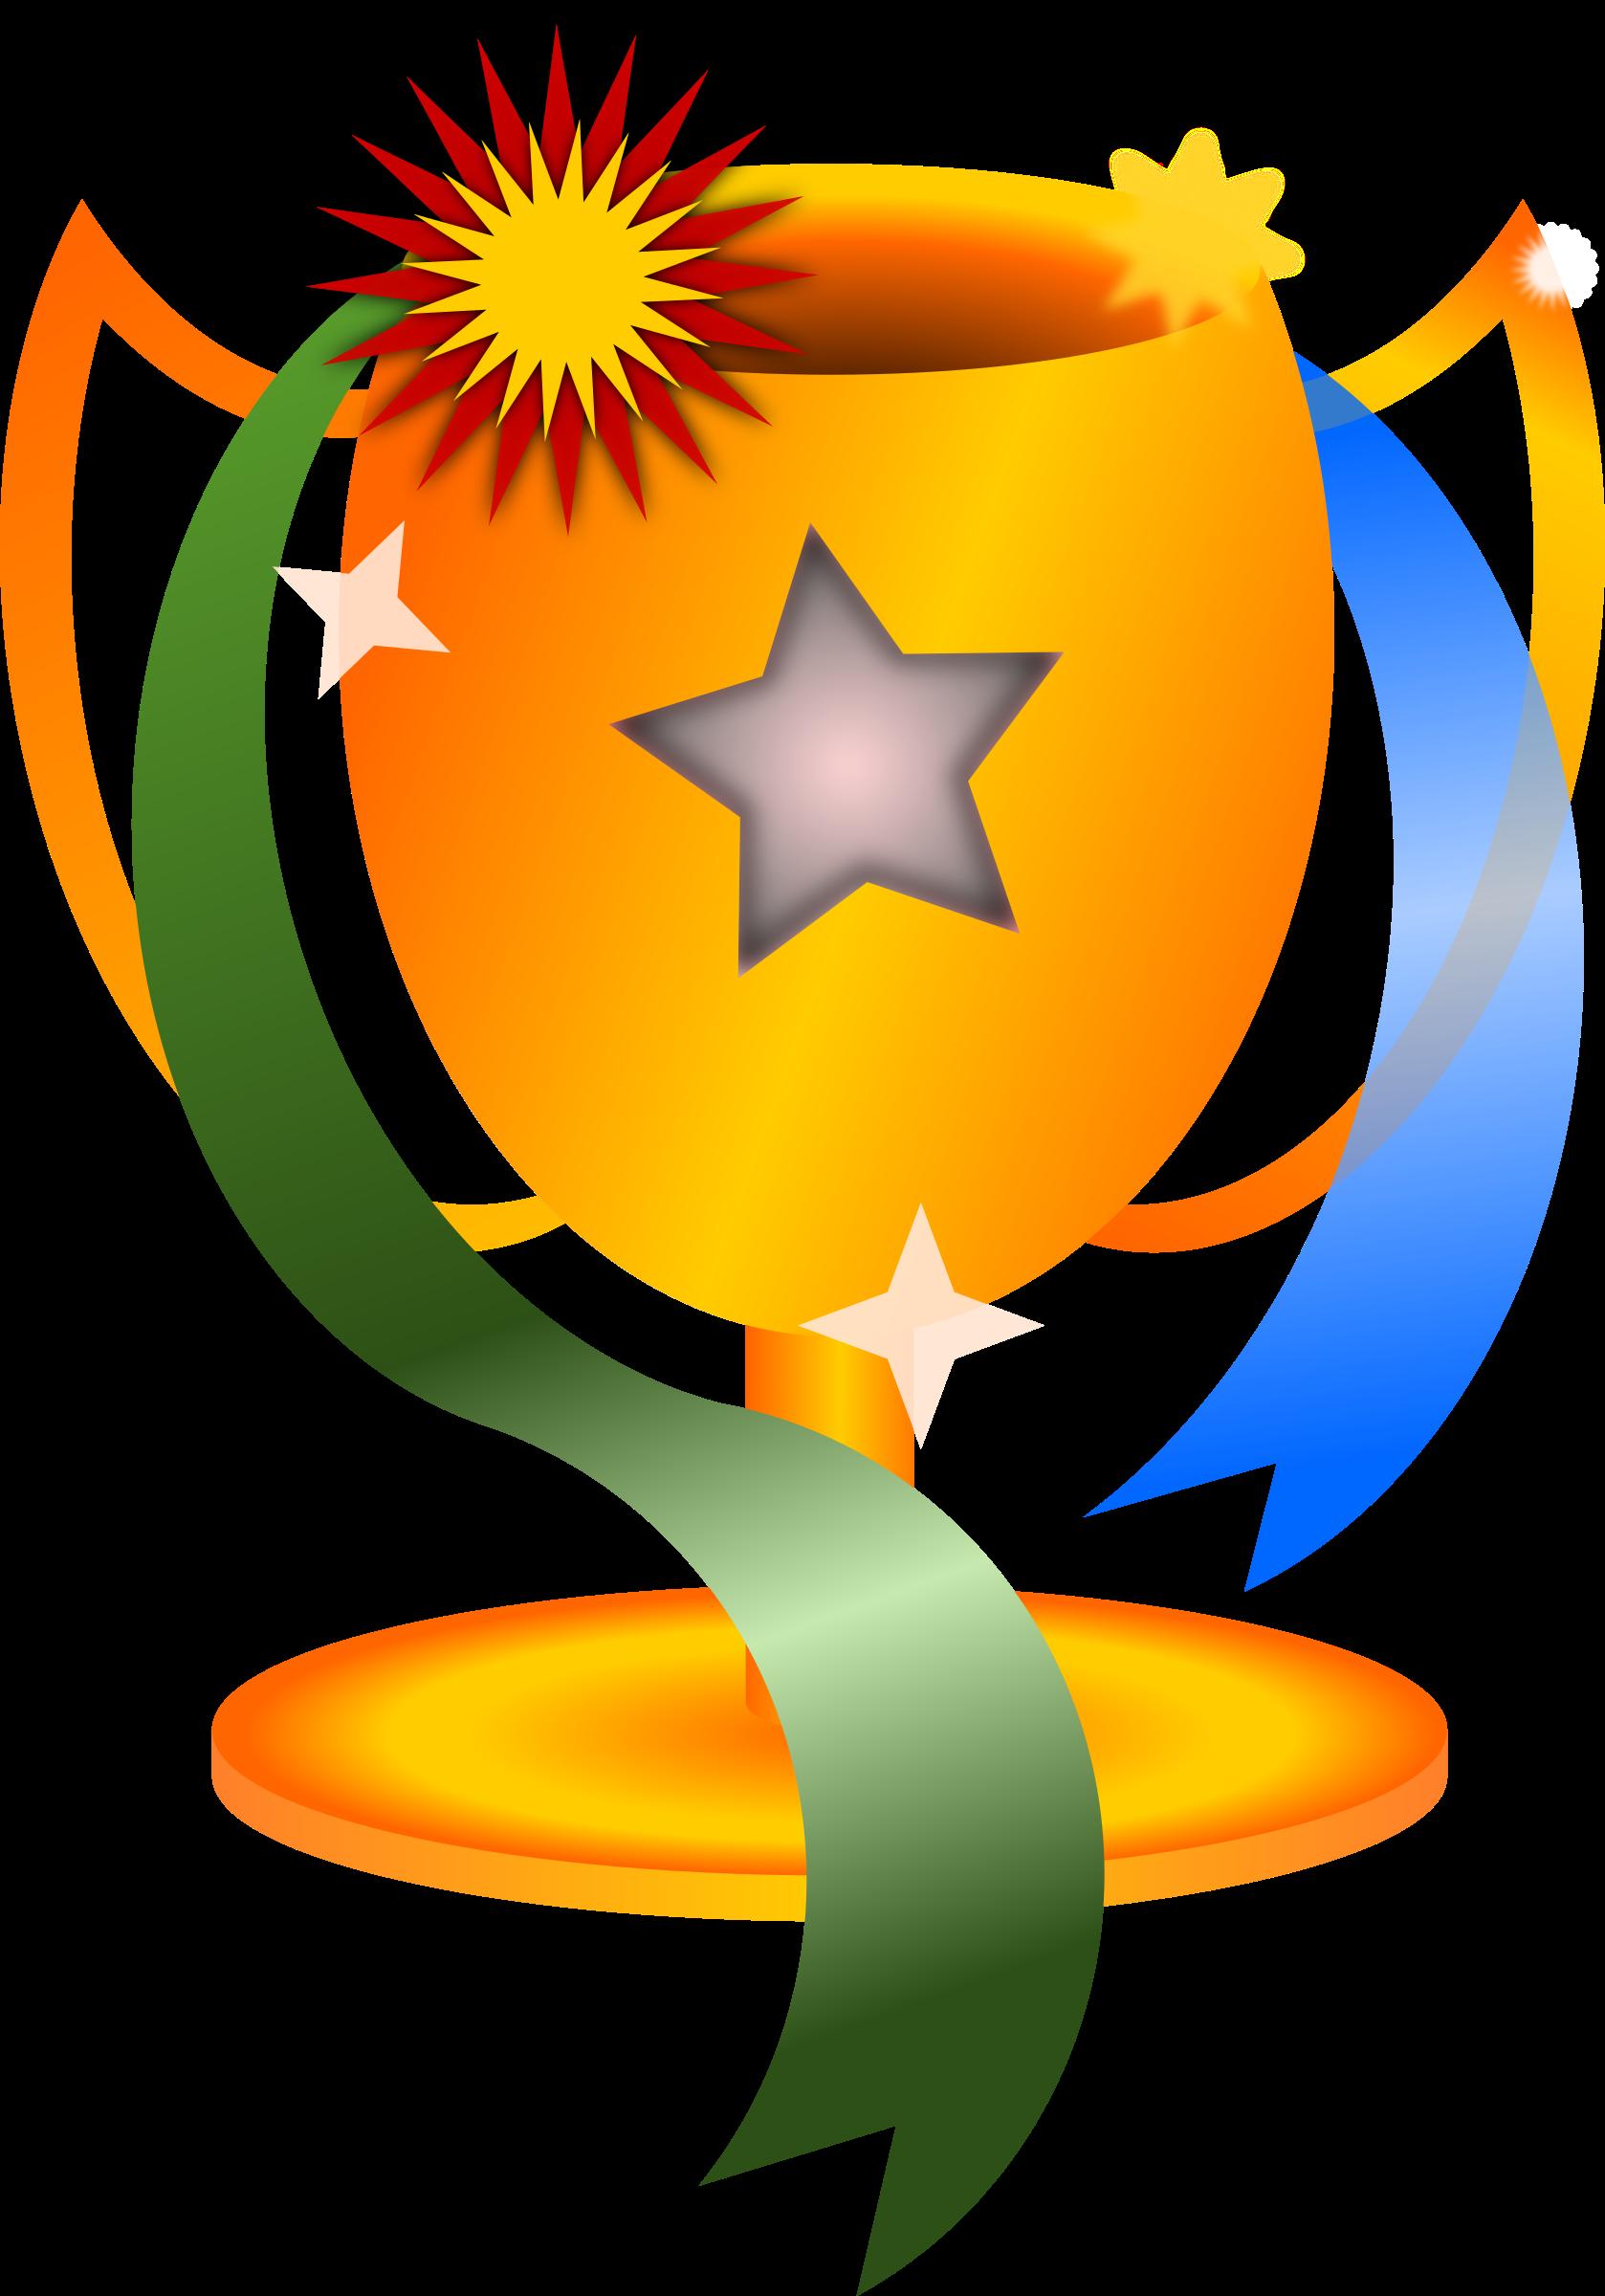 Clipart stars trophy. Star clip art wikiclipart